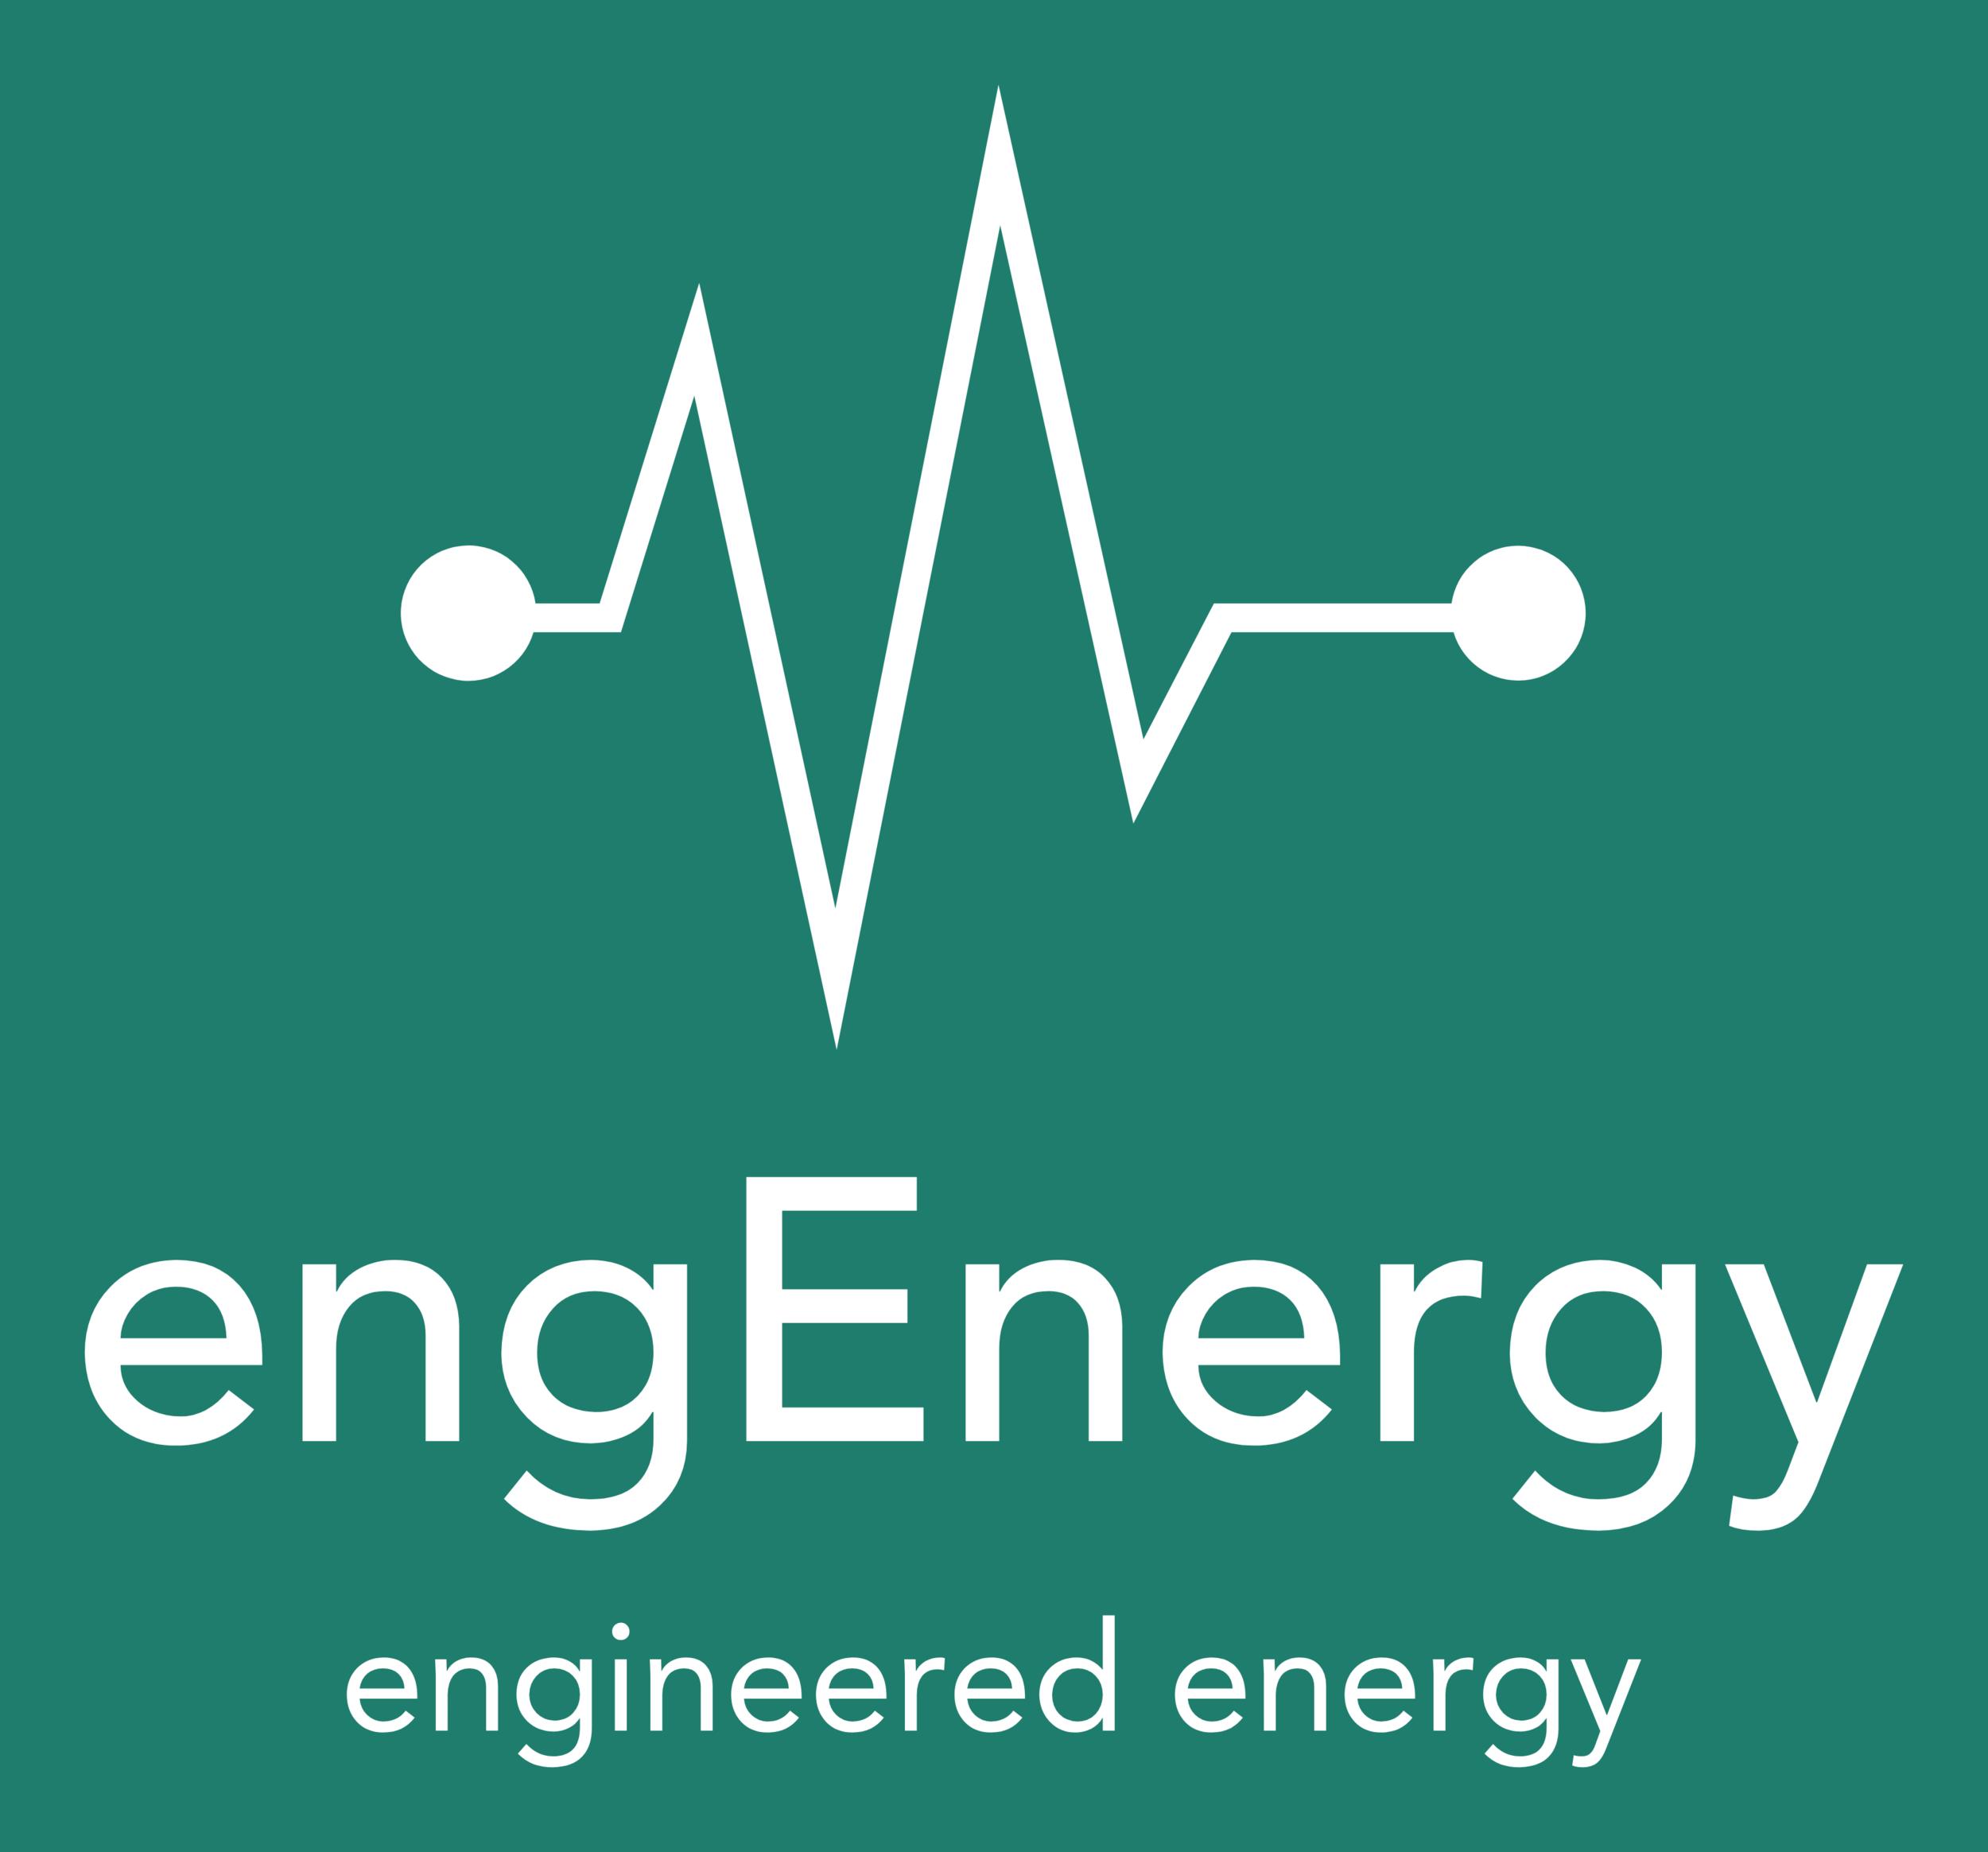 EngEnergy